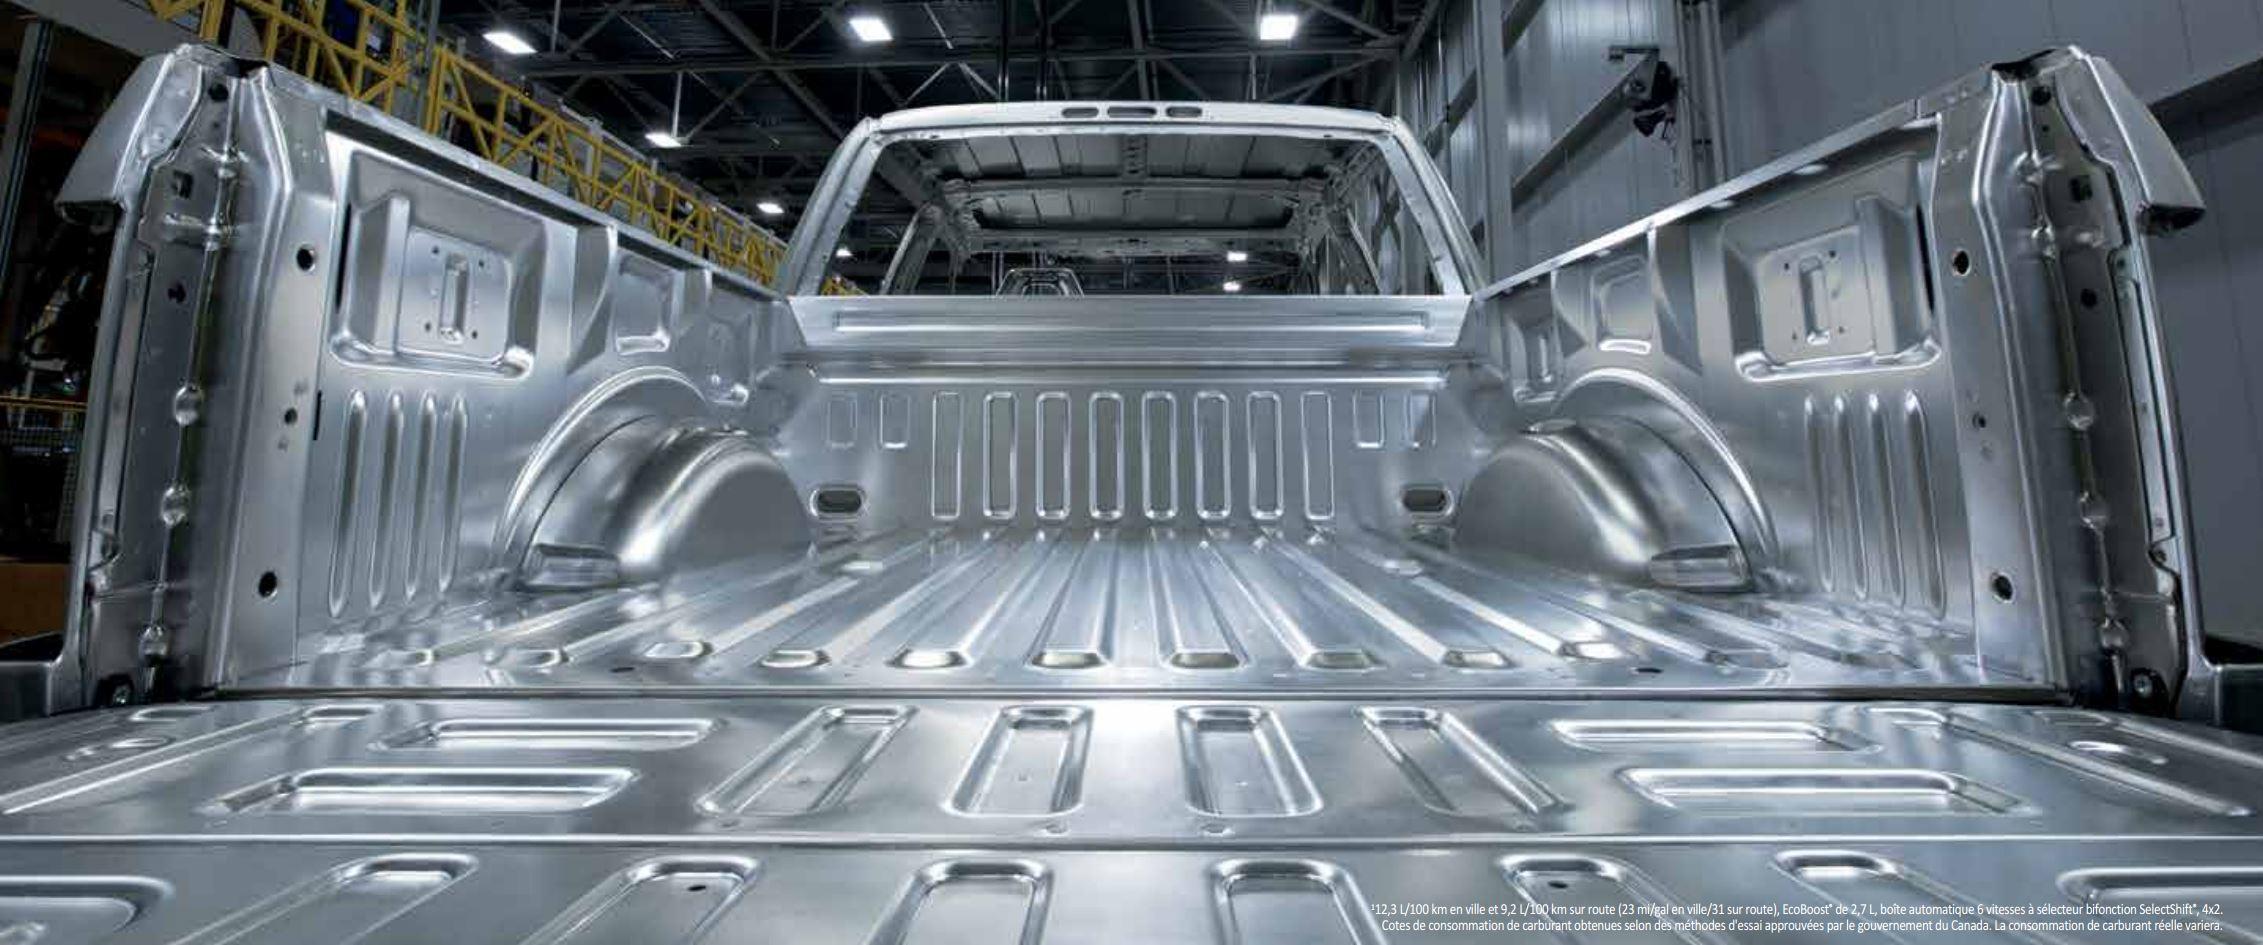 ford f 150 aluminium body ottawa kanata